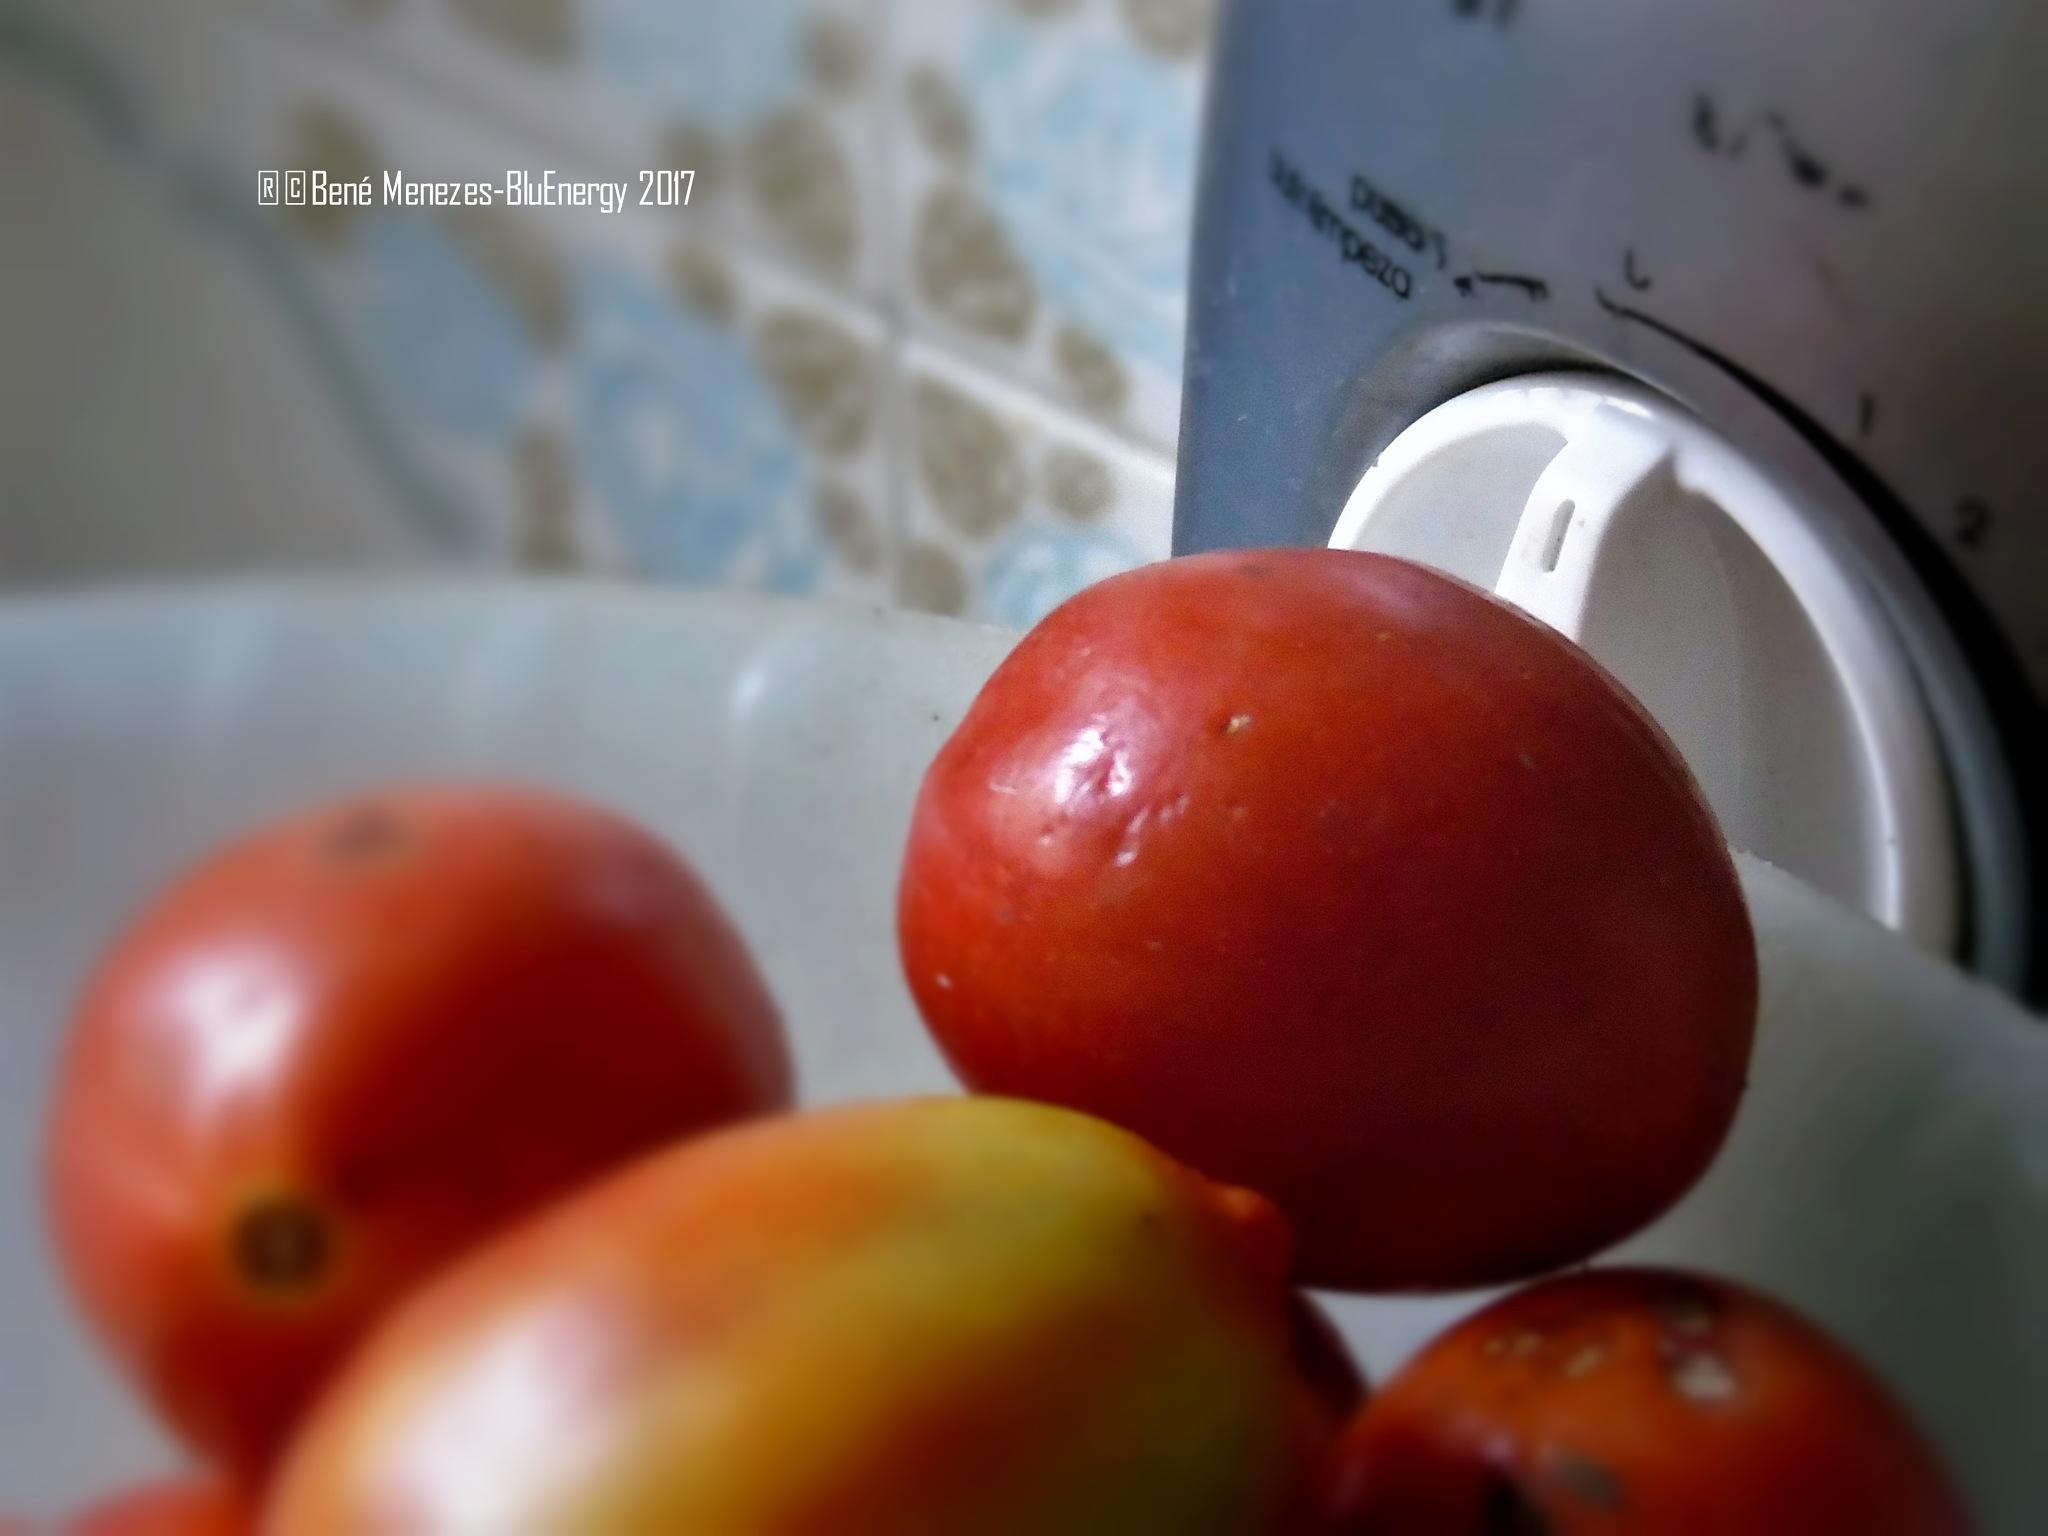 In My Sweet Home Kitchen! by Bené Menezes